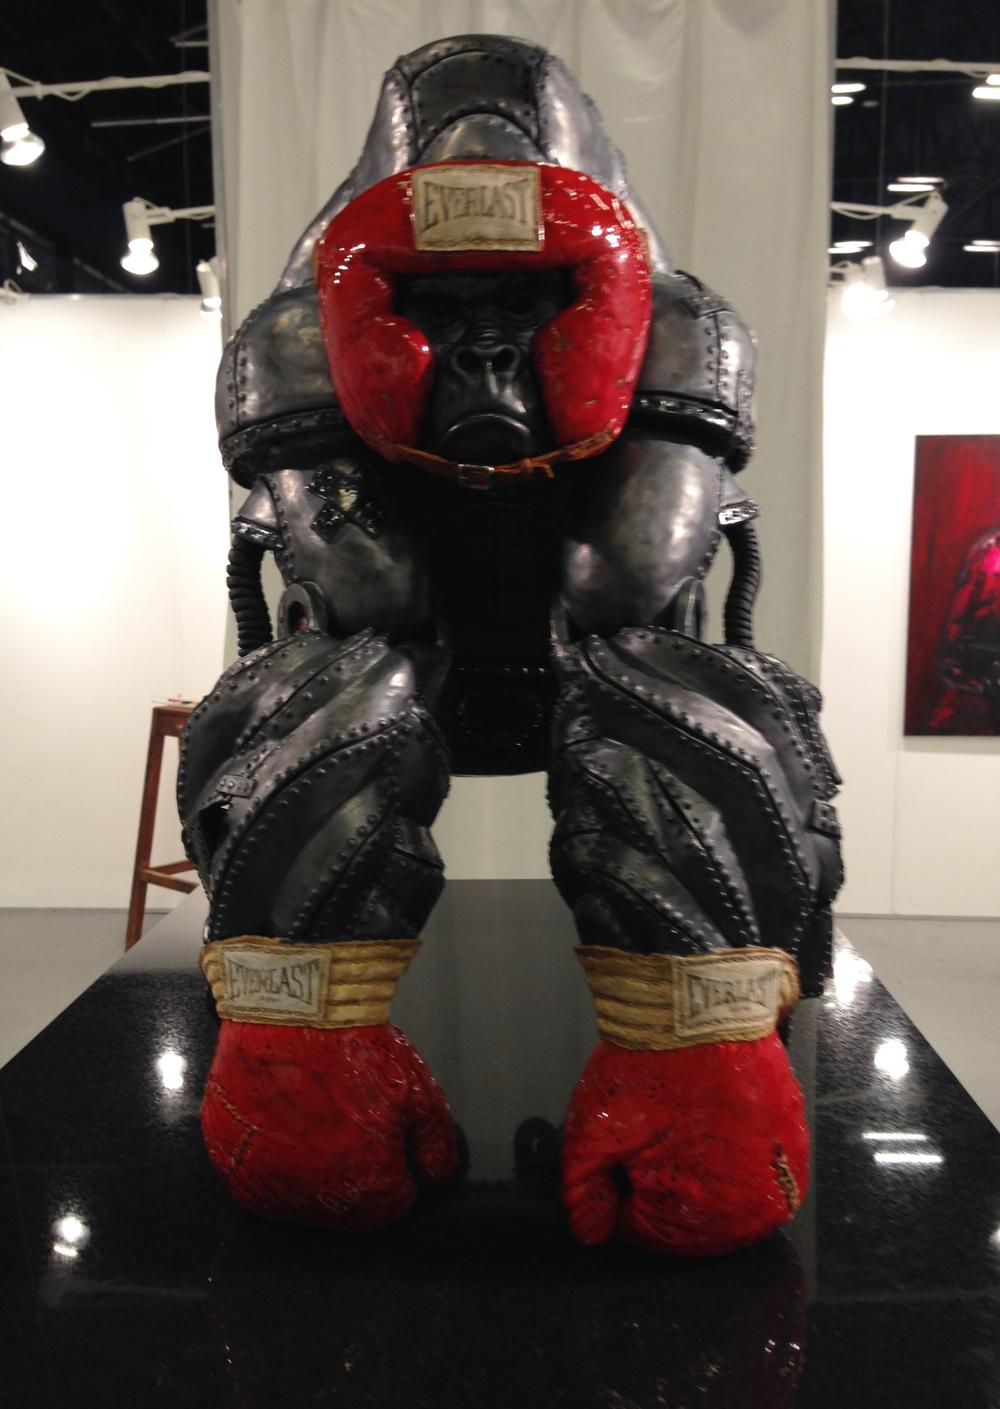 33.  Alan Waring -  Oxholm Gallery  (DK)